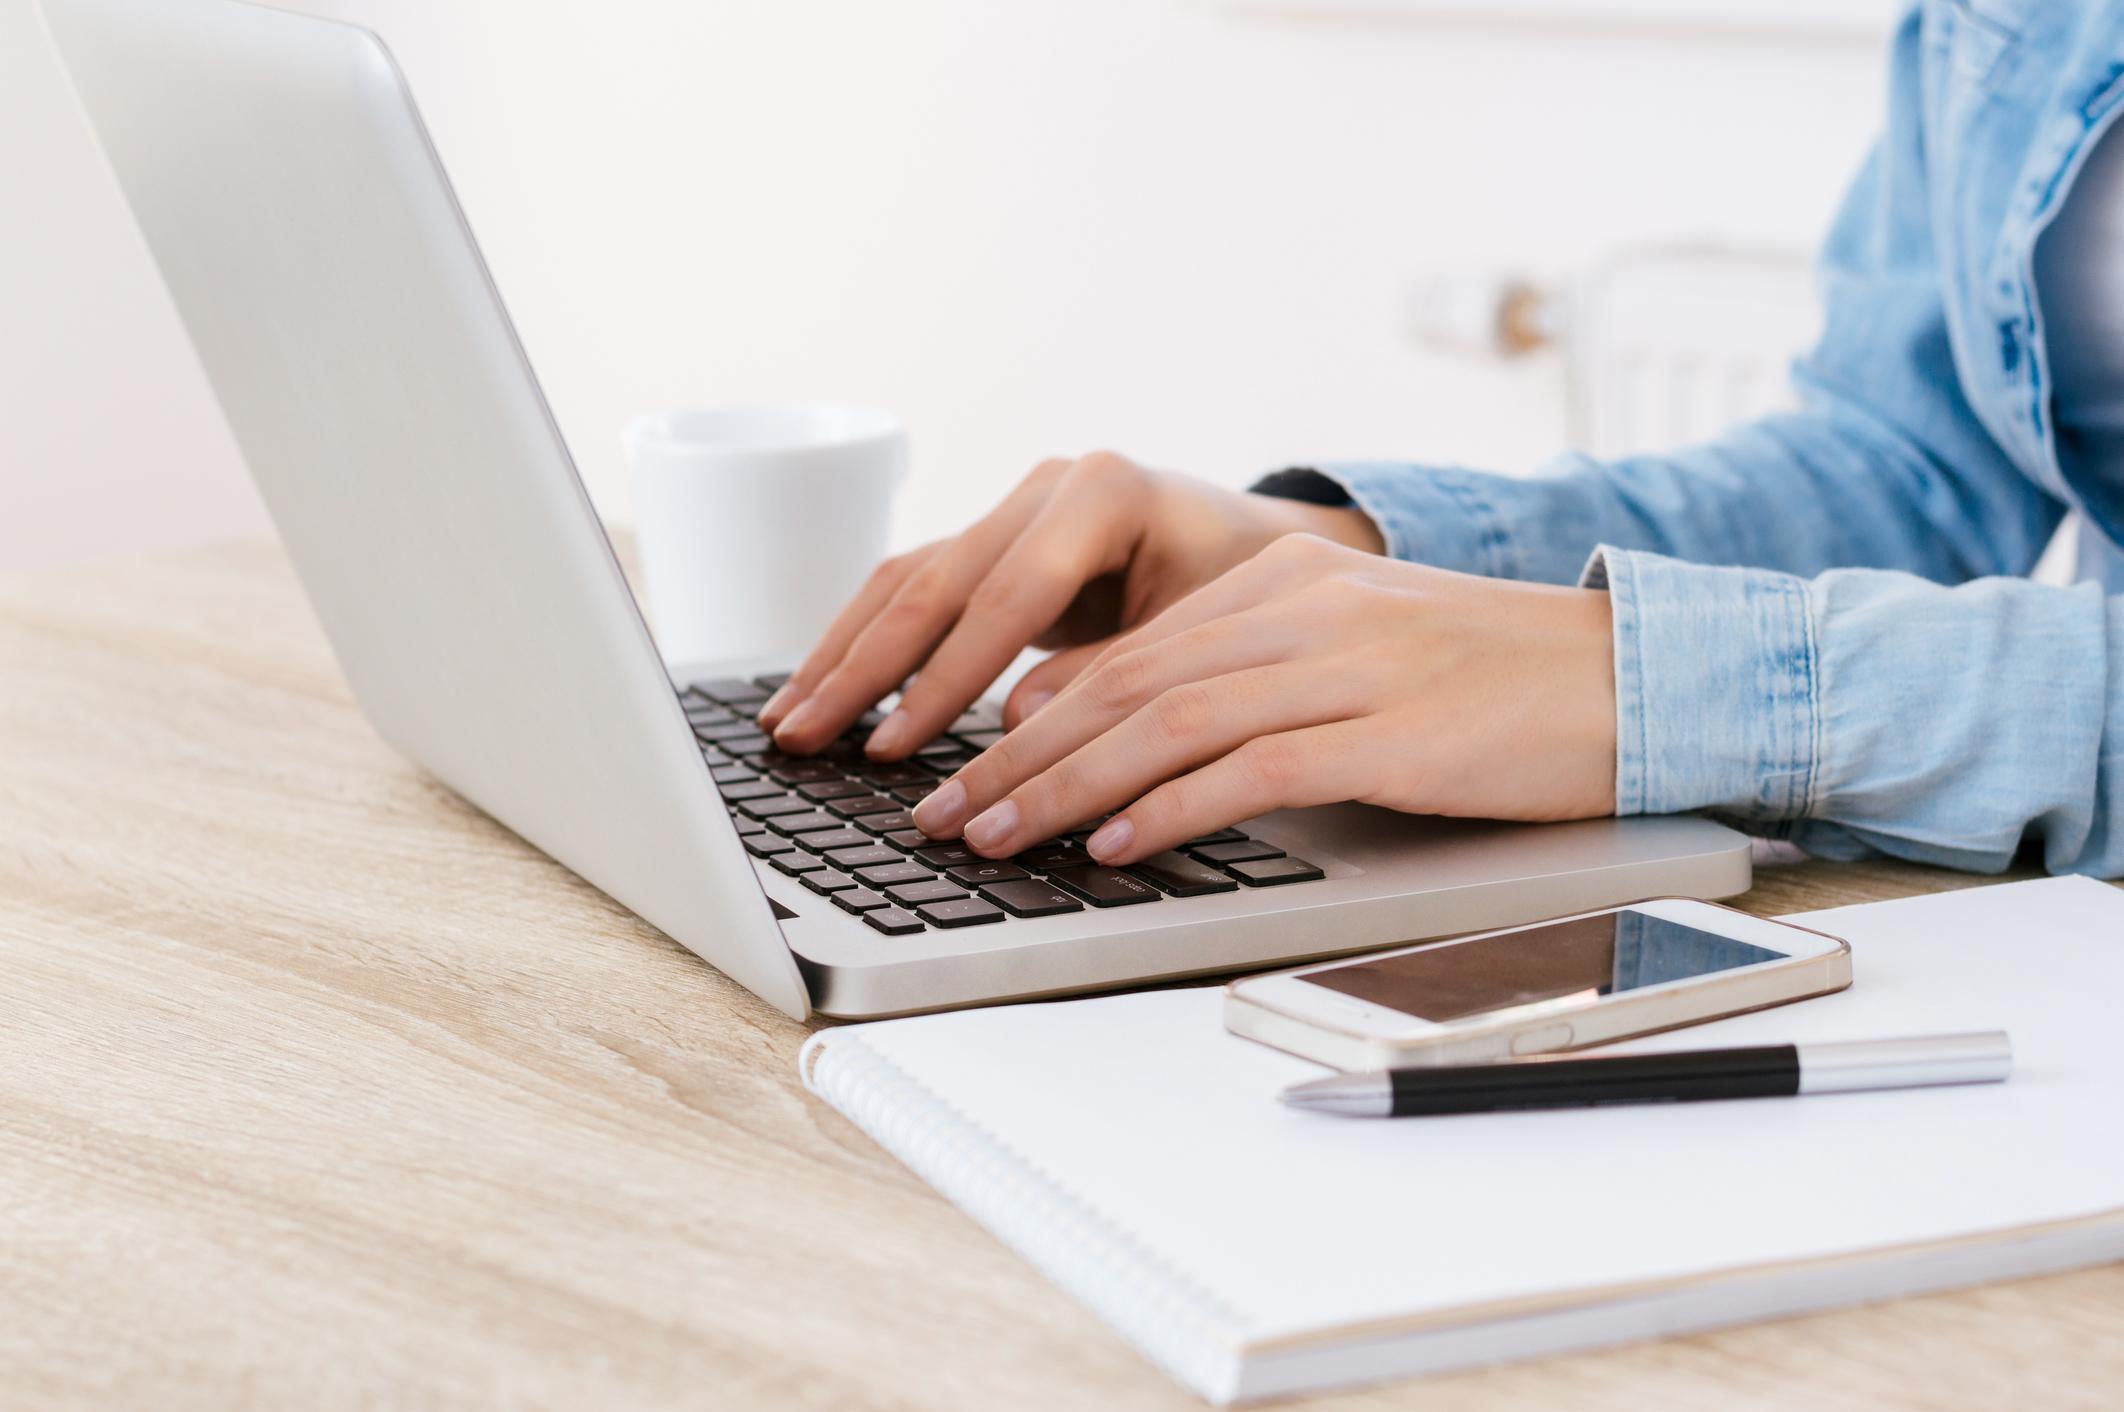 Hands  in denim typing on laptop keyboard